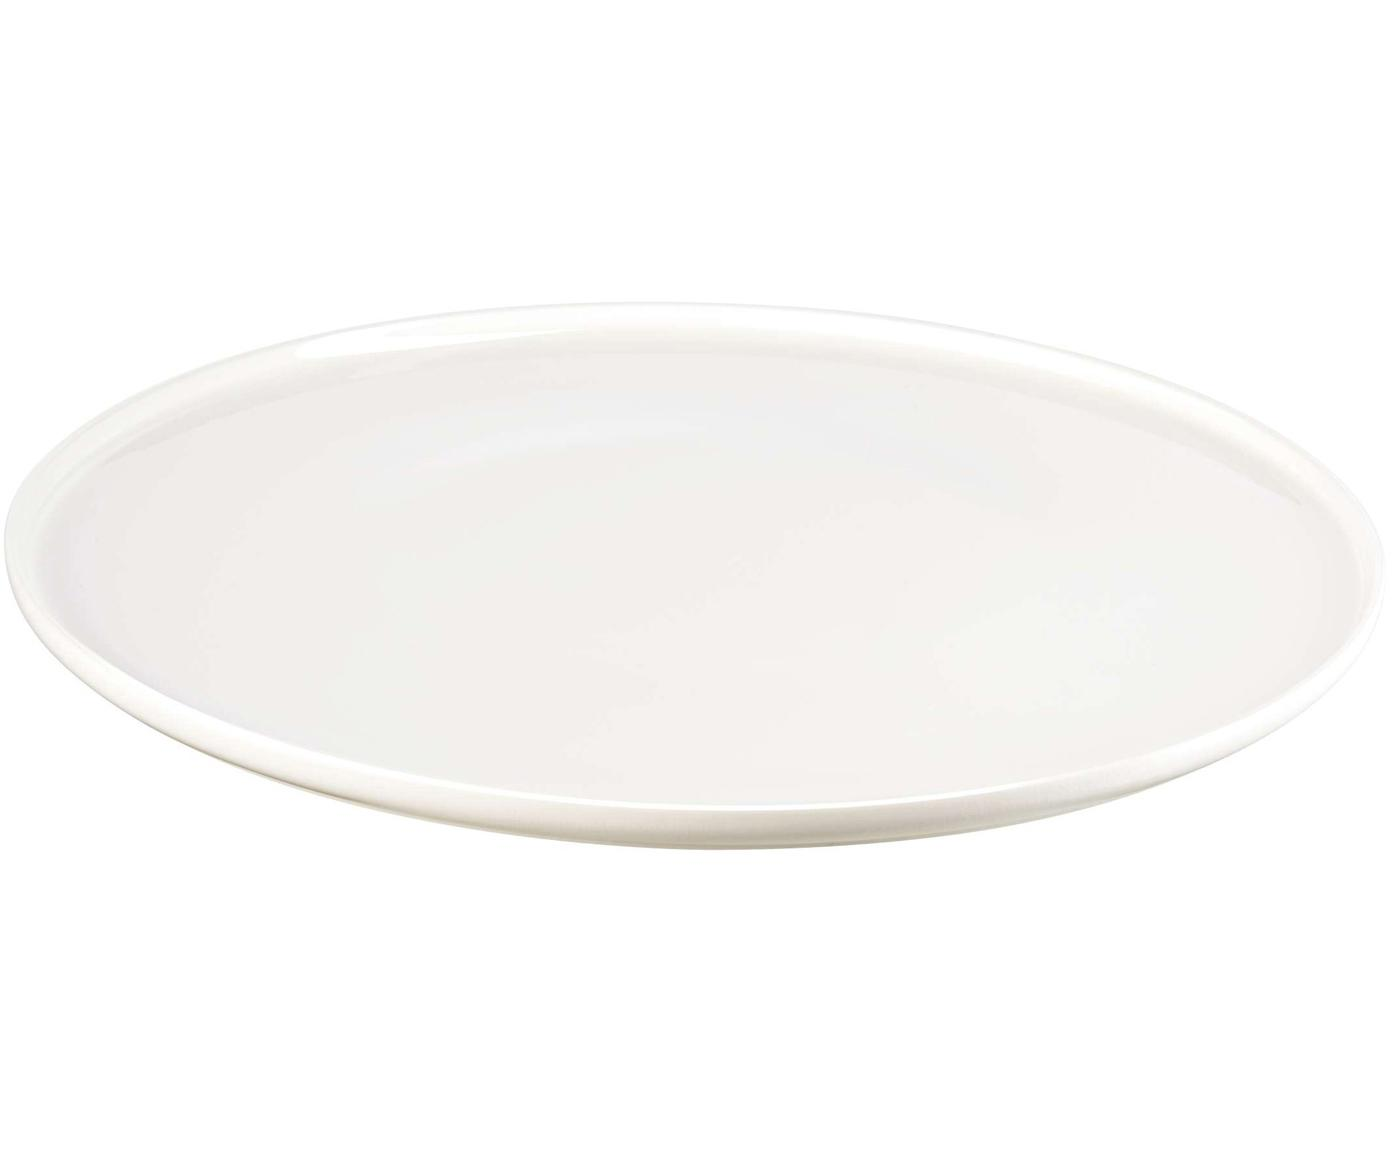 Plato llano Oco, 6 uds., Porcelana fina, Blanco, Ø 27 cm